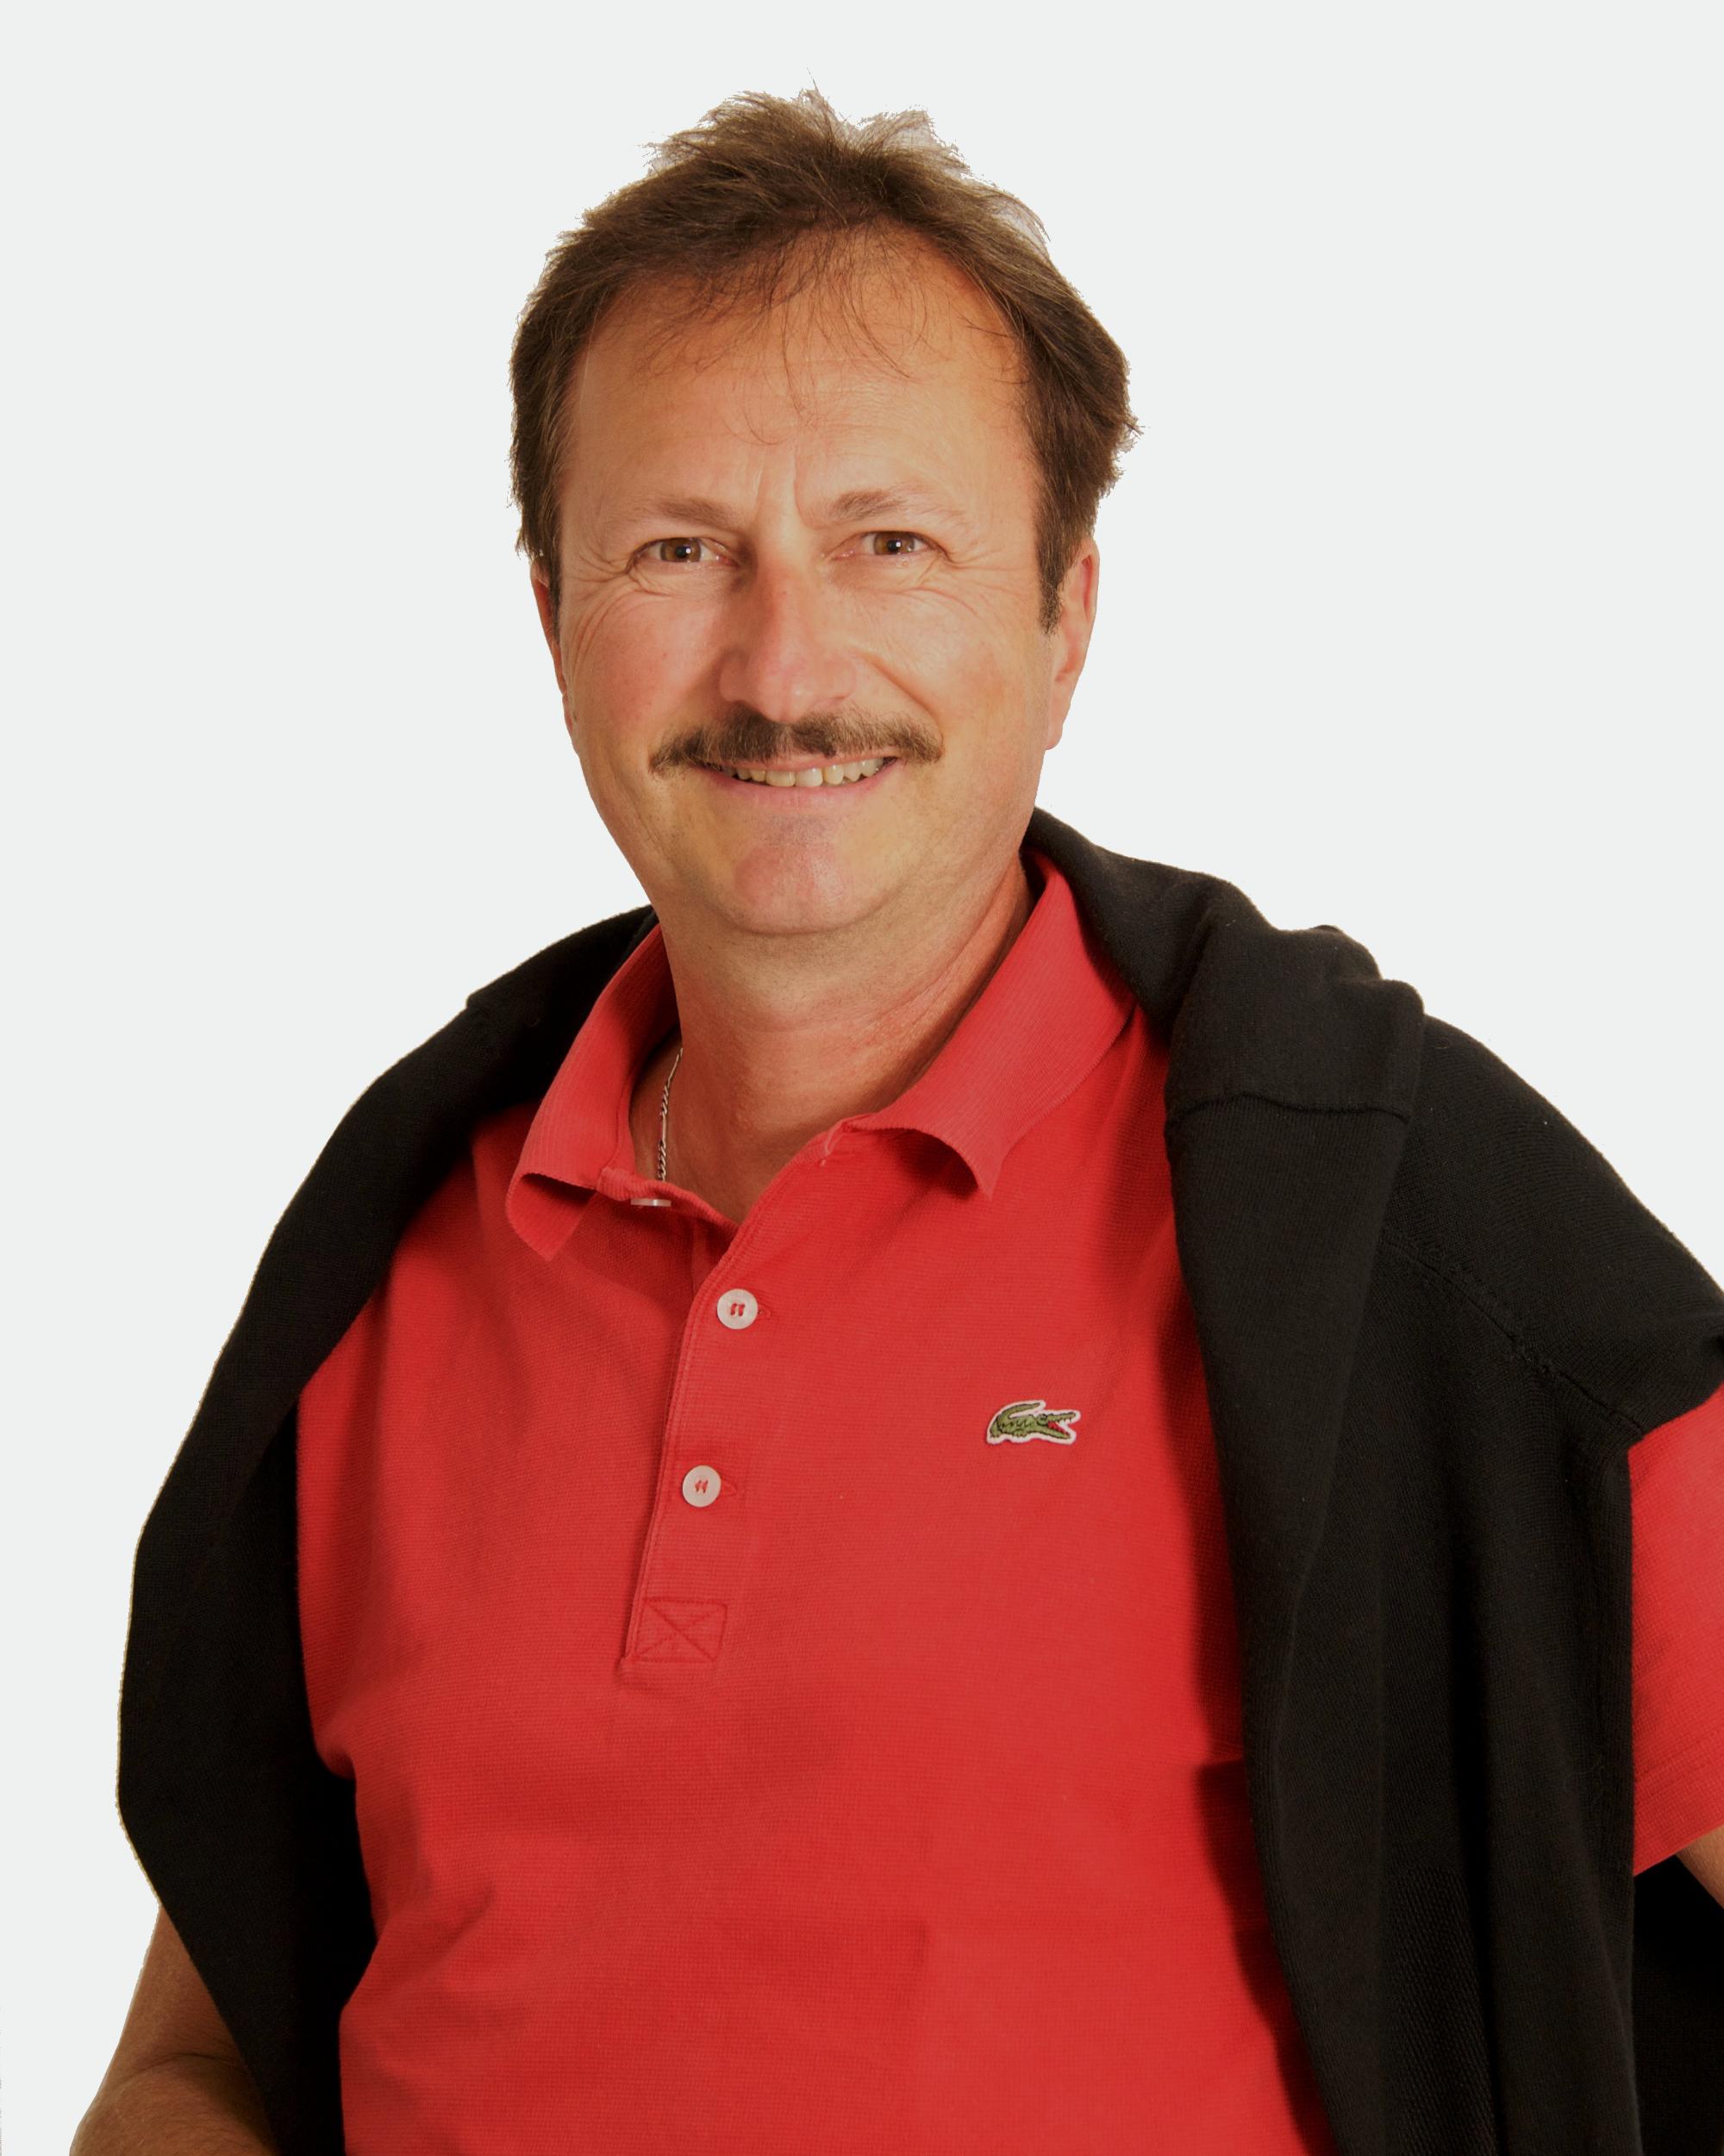 Dipl. Päd Andreas Reisinger